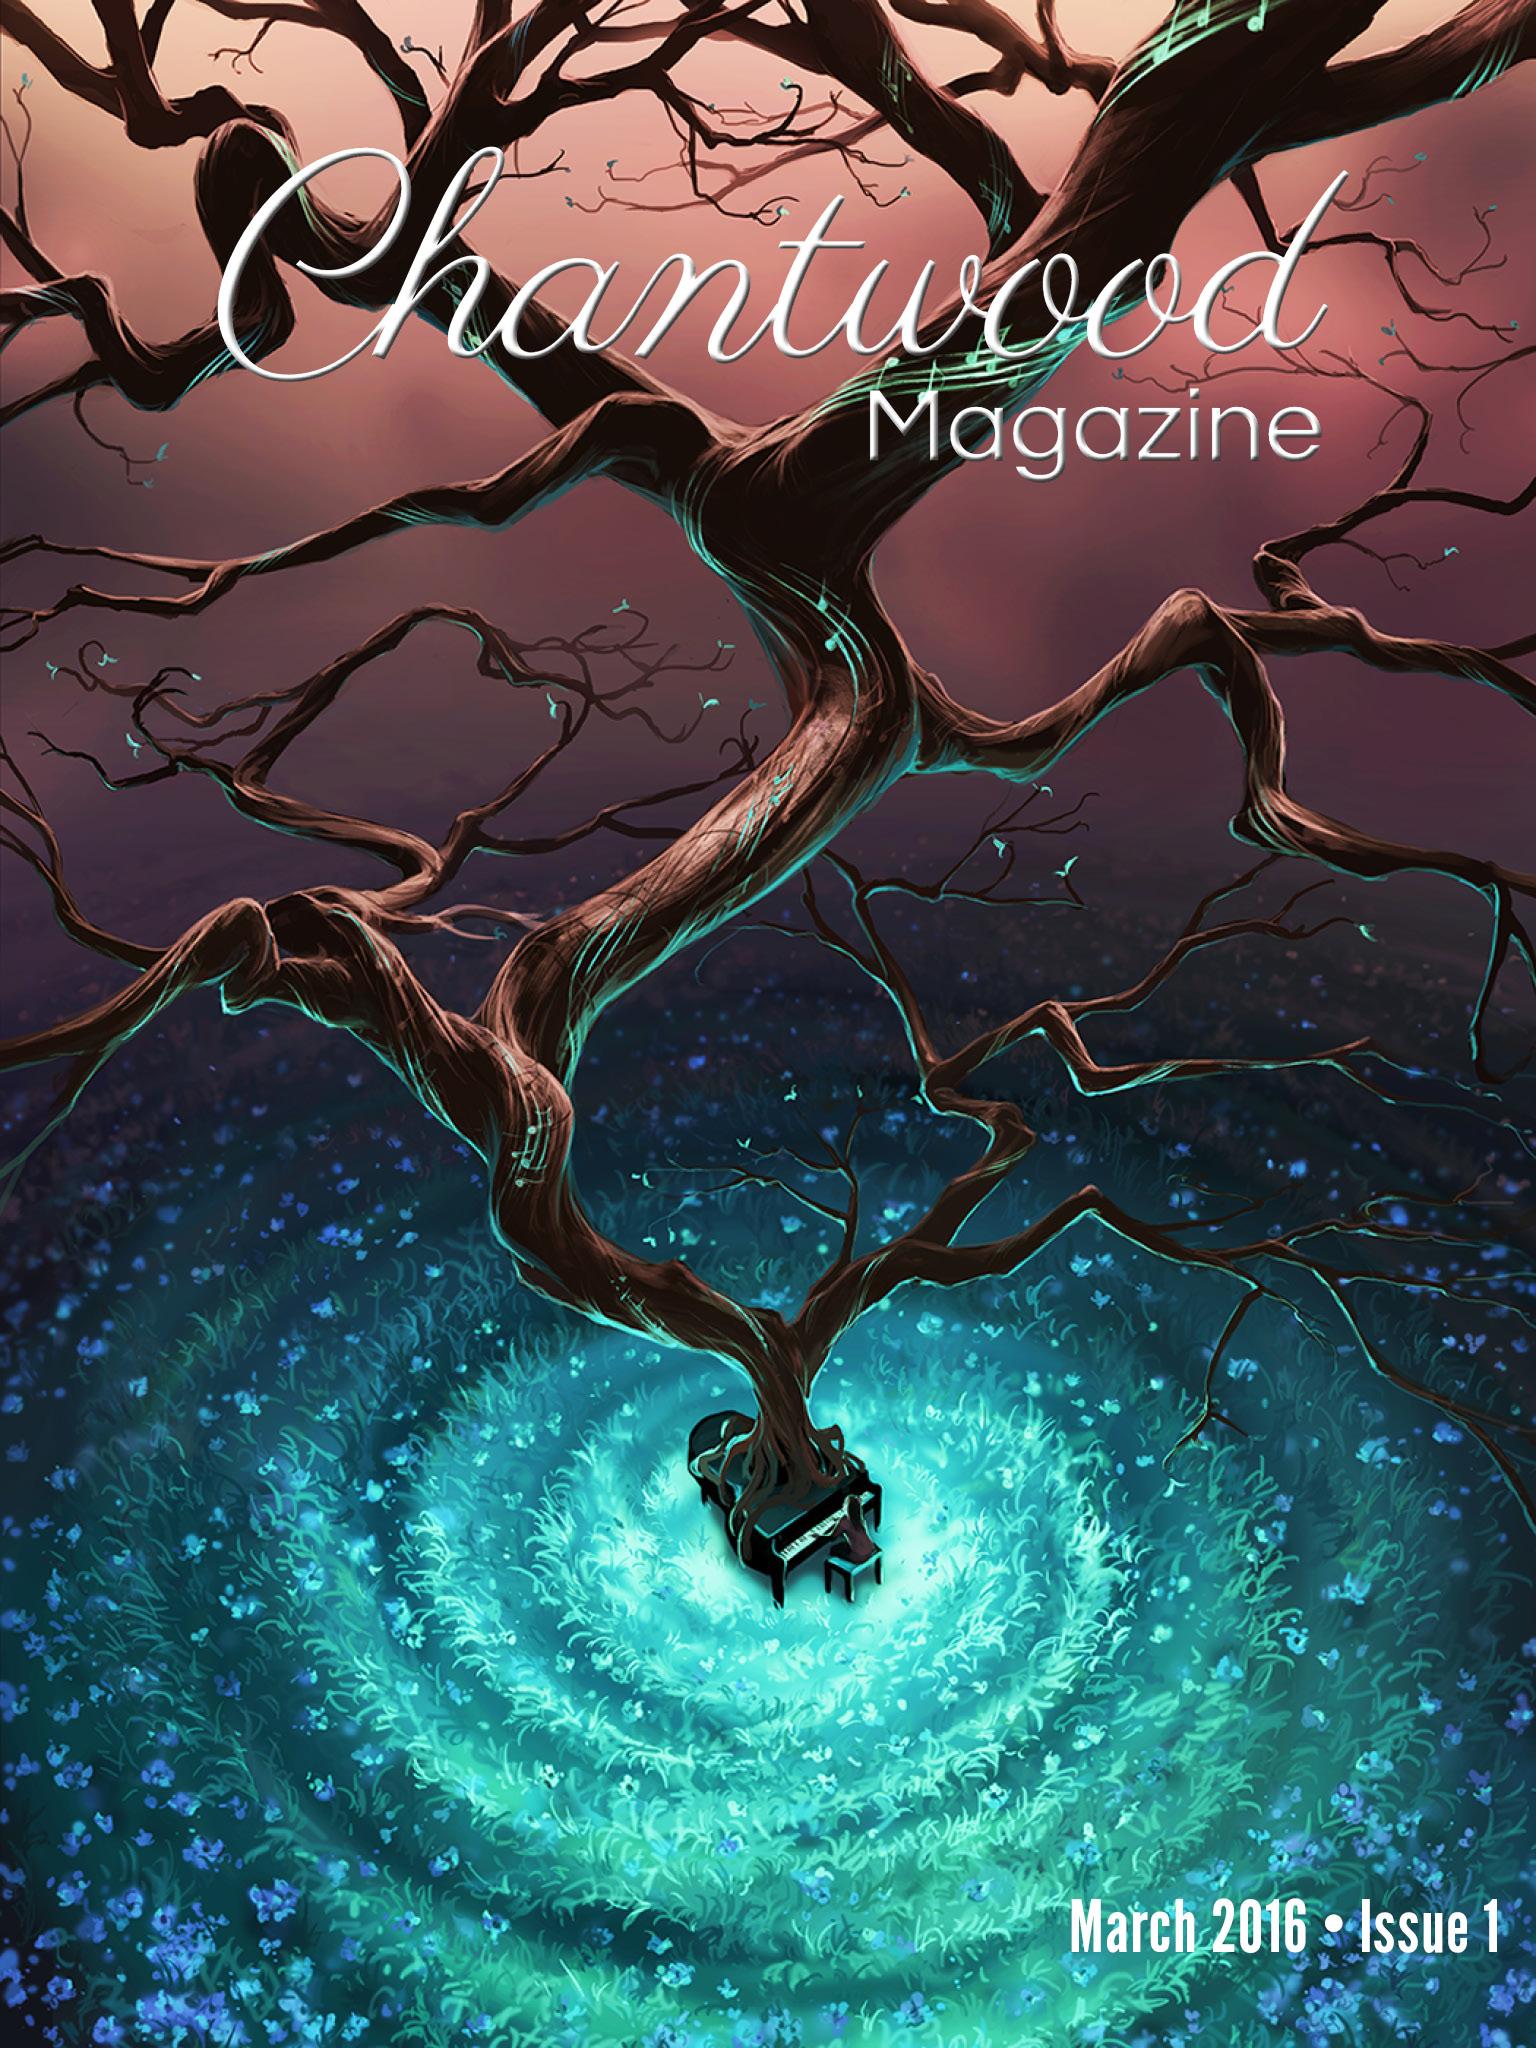 Chantwood Literary Magazine Issue 1